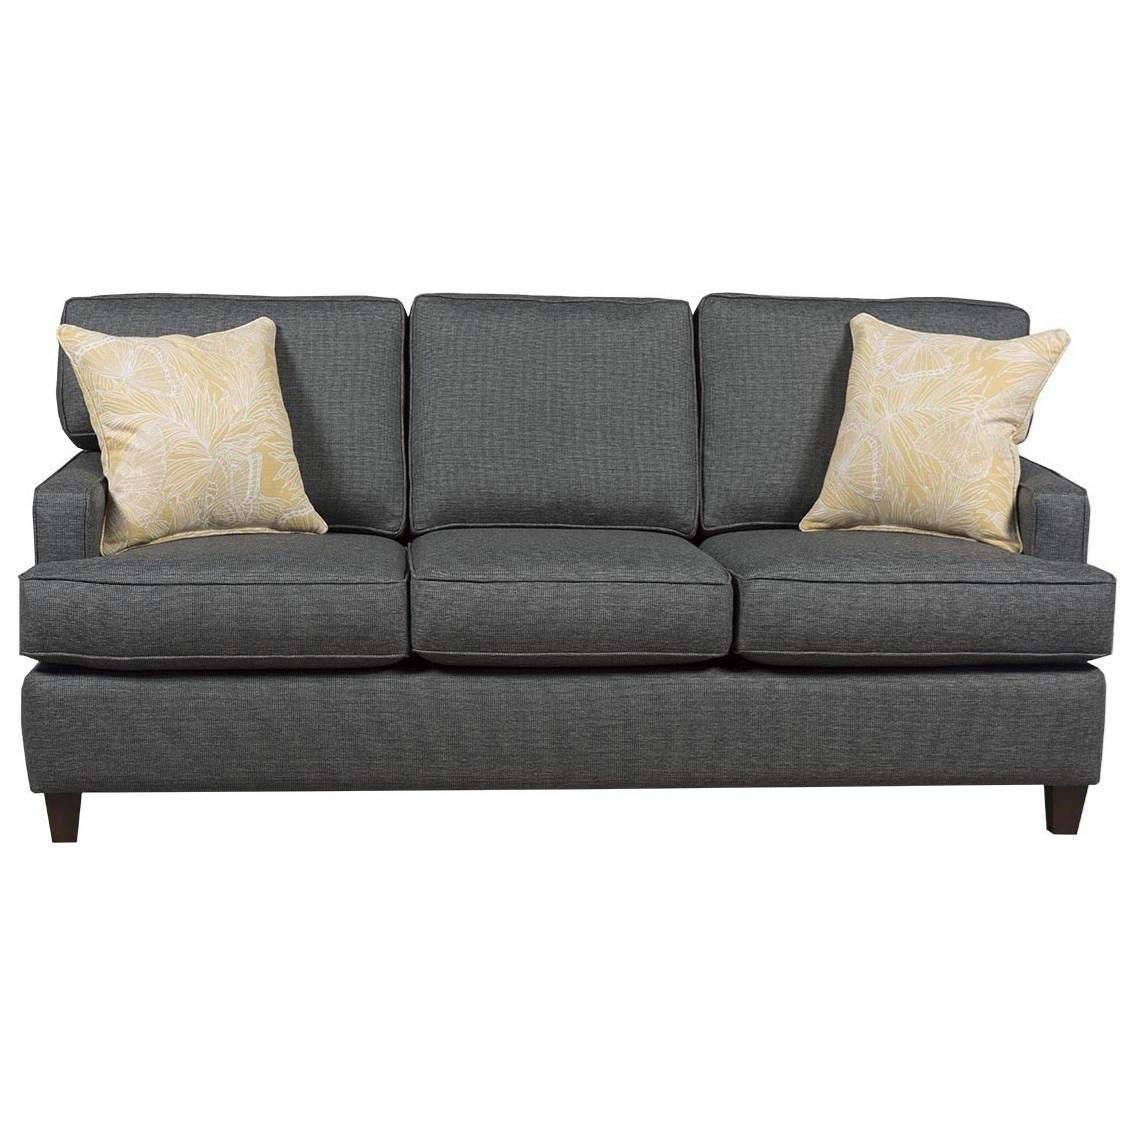 162 Sofa by Capris Furniture at Baer's Furniture